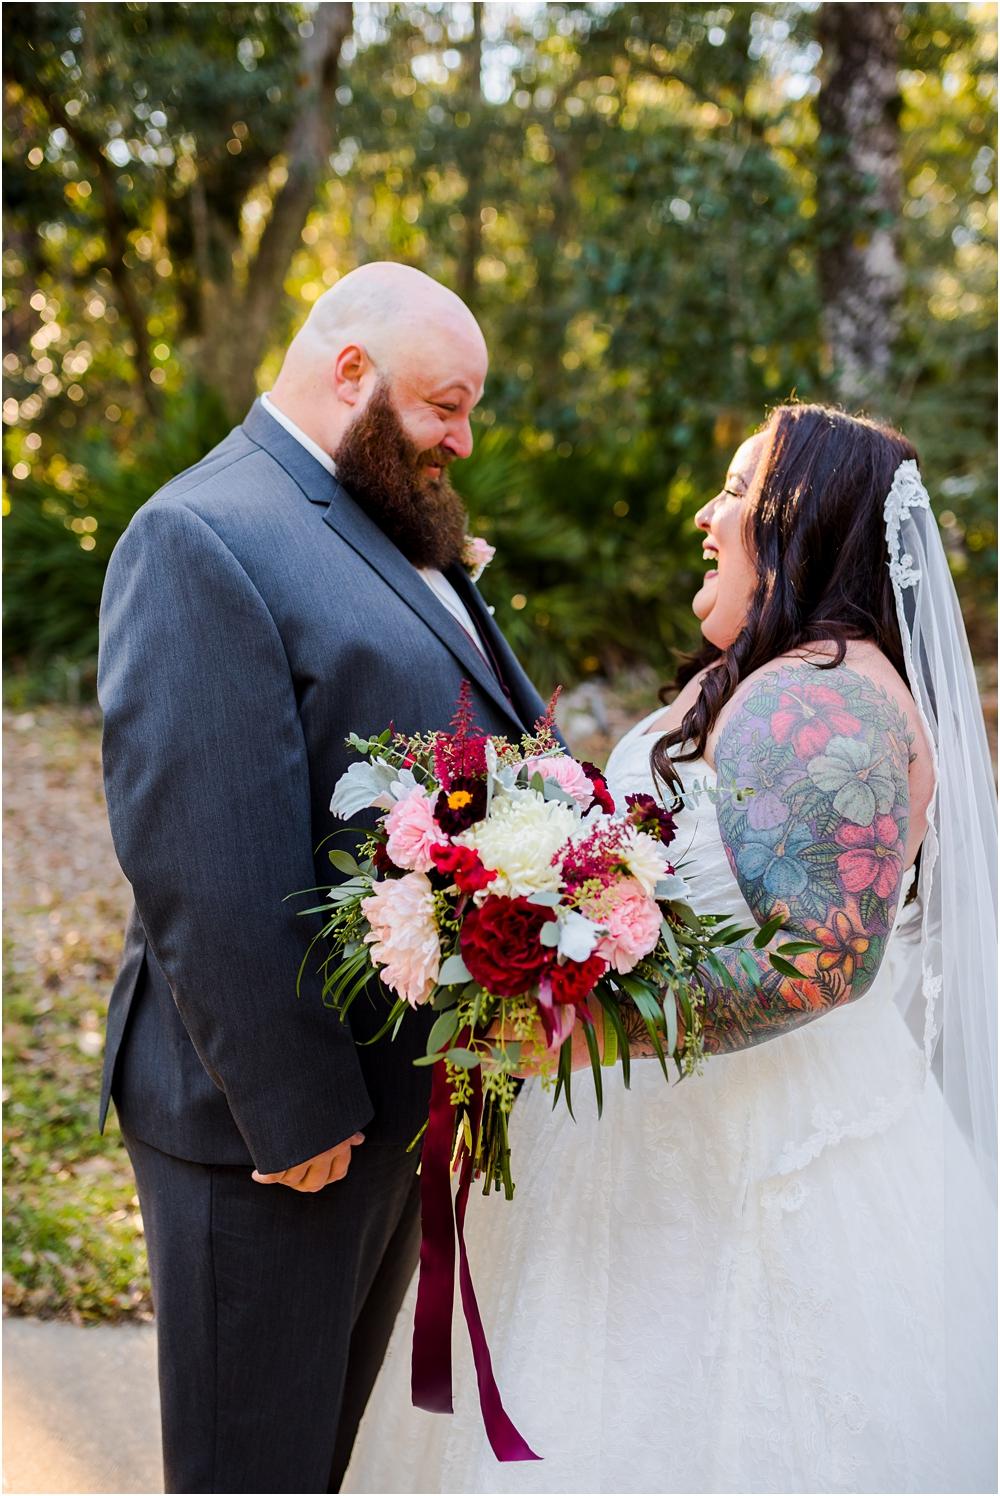 Eden-Gardens-florida-wedding-photographer-kiersten-stevenson-photography-37.jpg